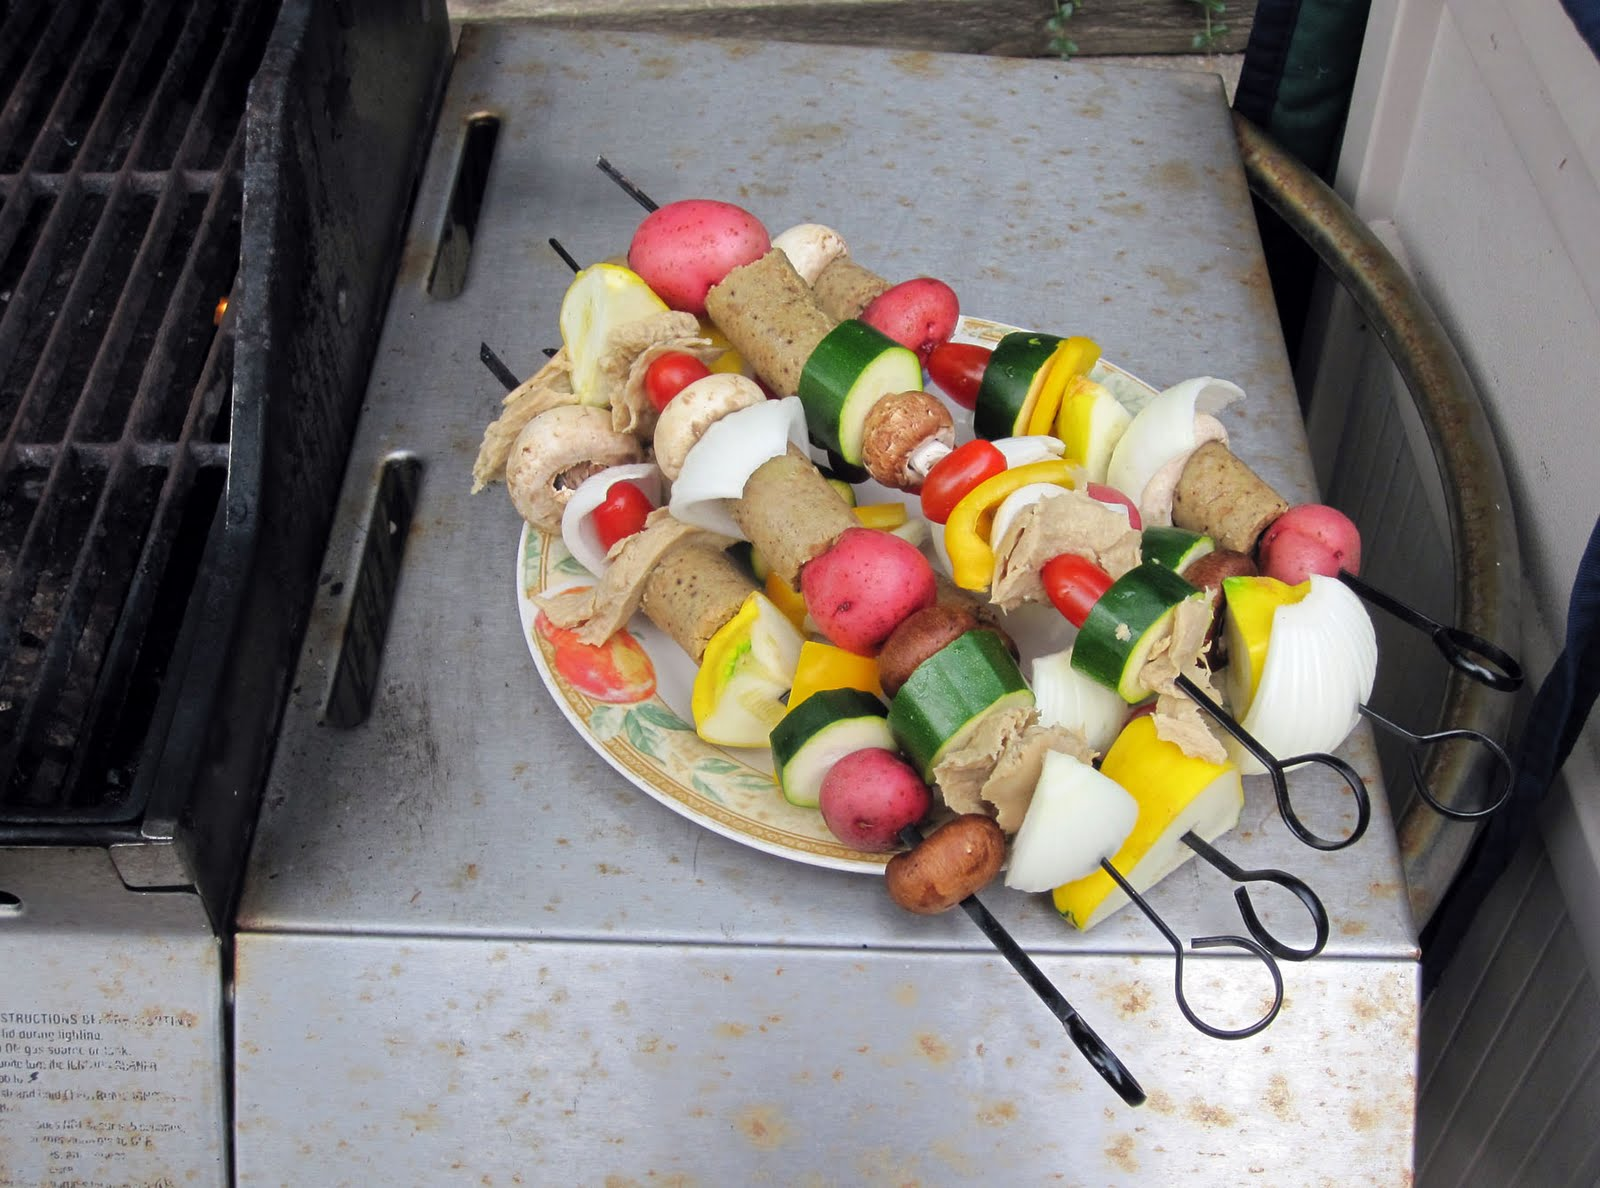 http://www.rubbercowgirl.com/2011/07/shish-kebab-boom-bah.html